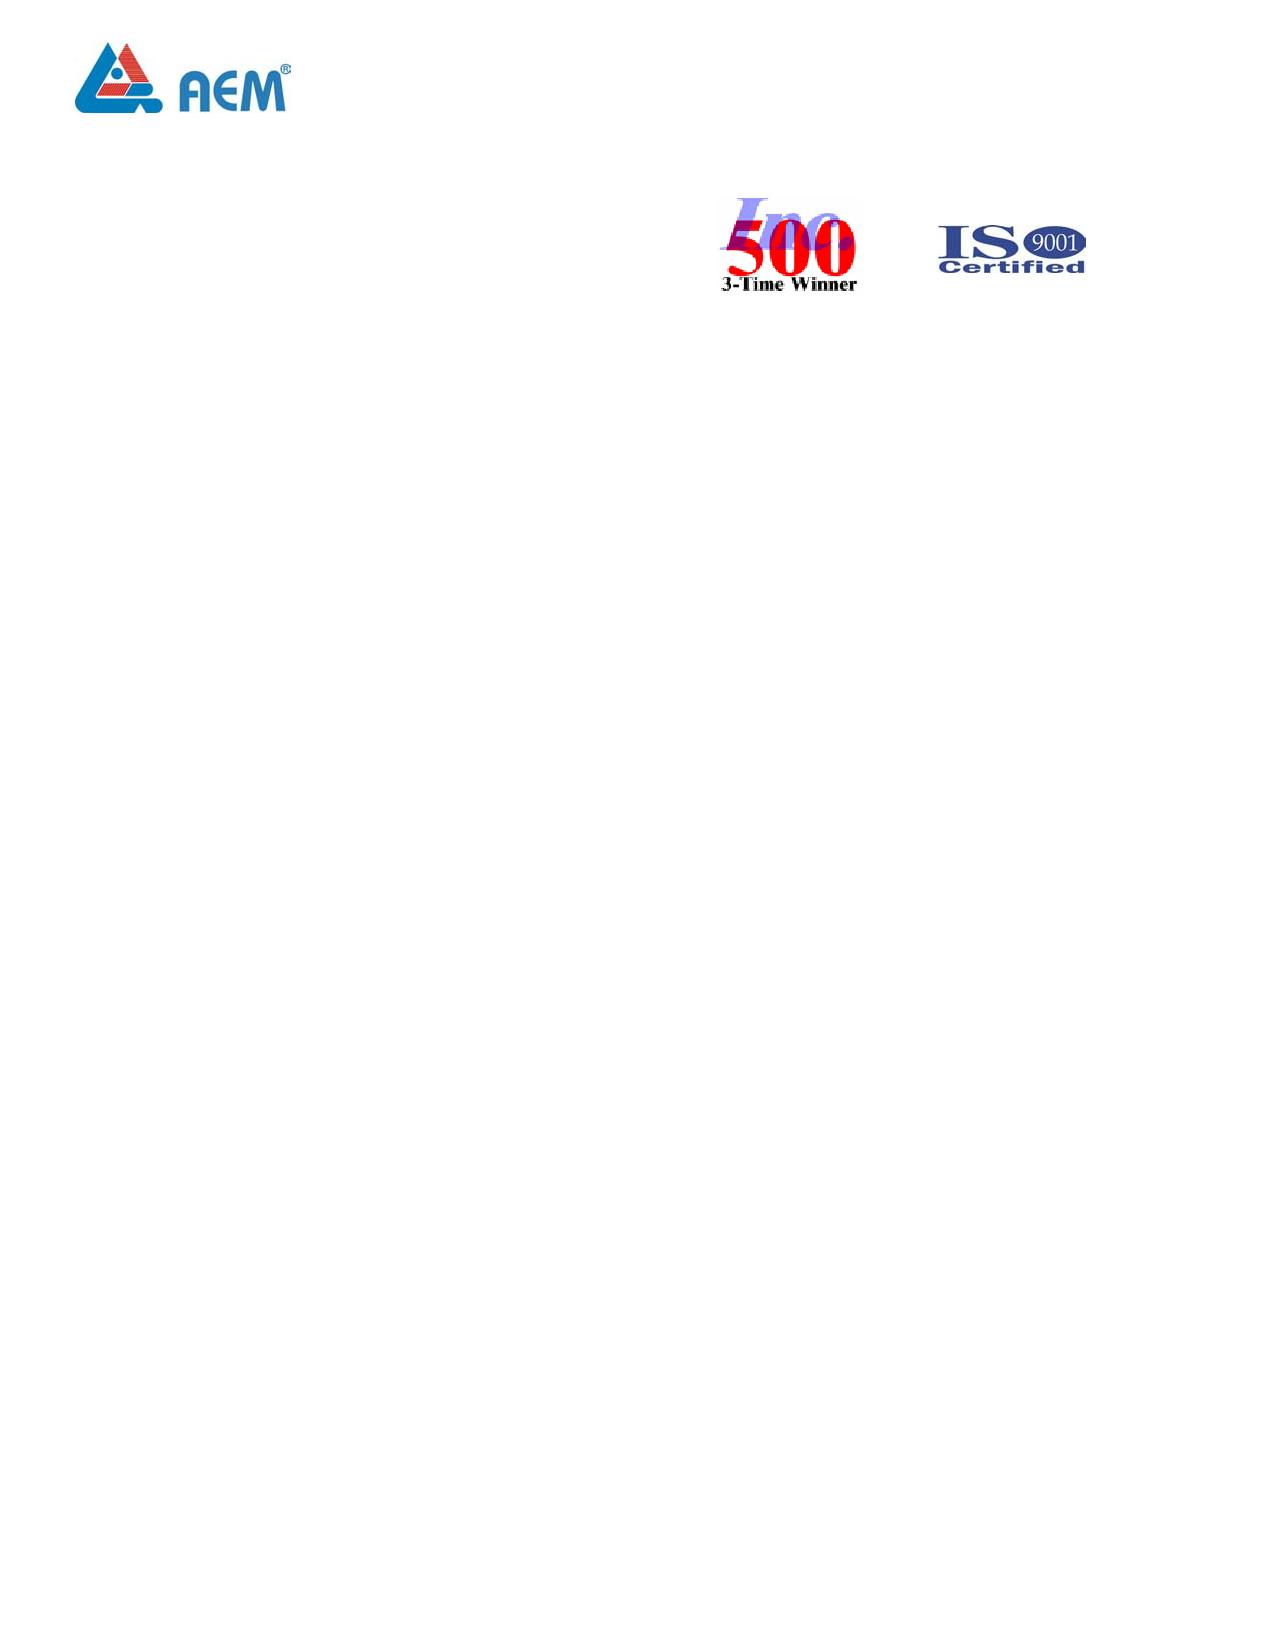 F0603FF0750V032T datasheet